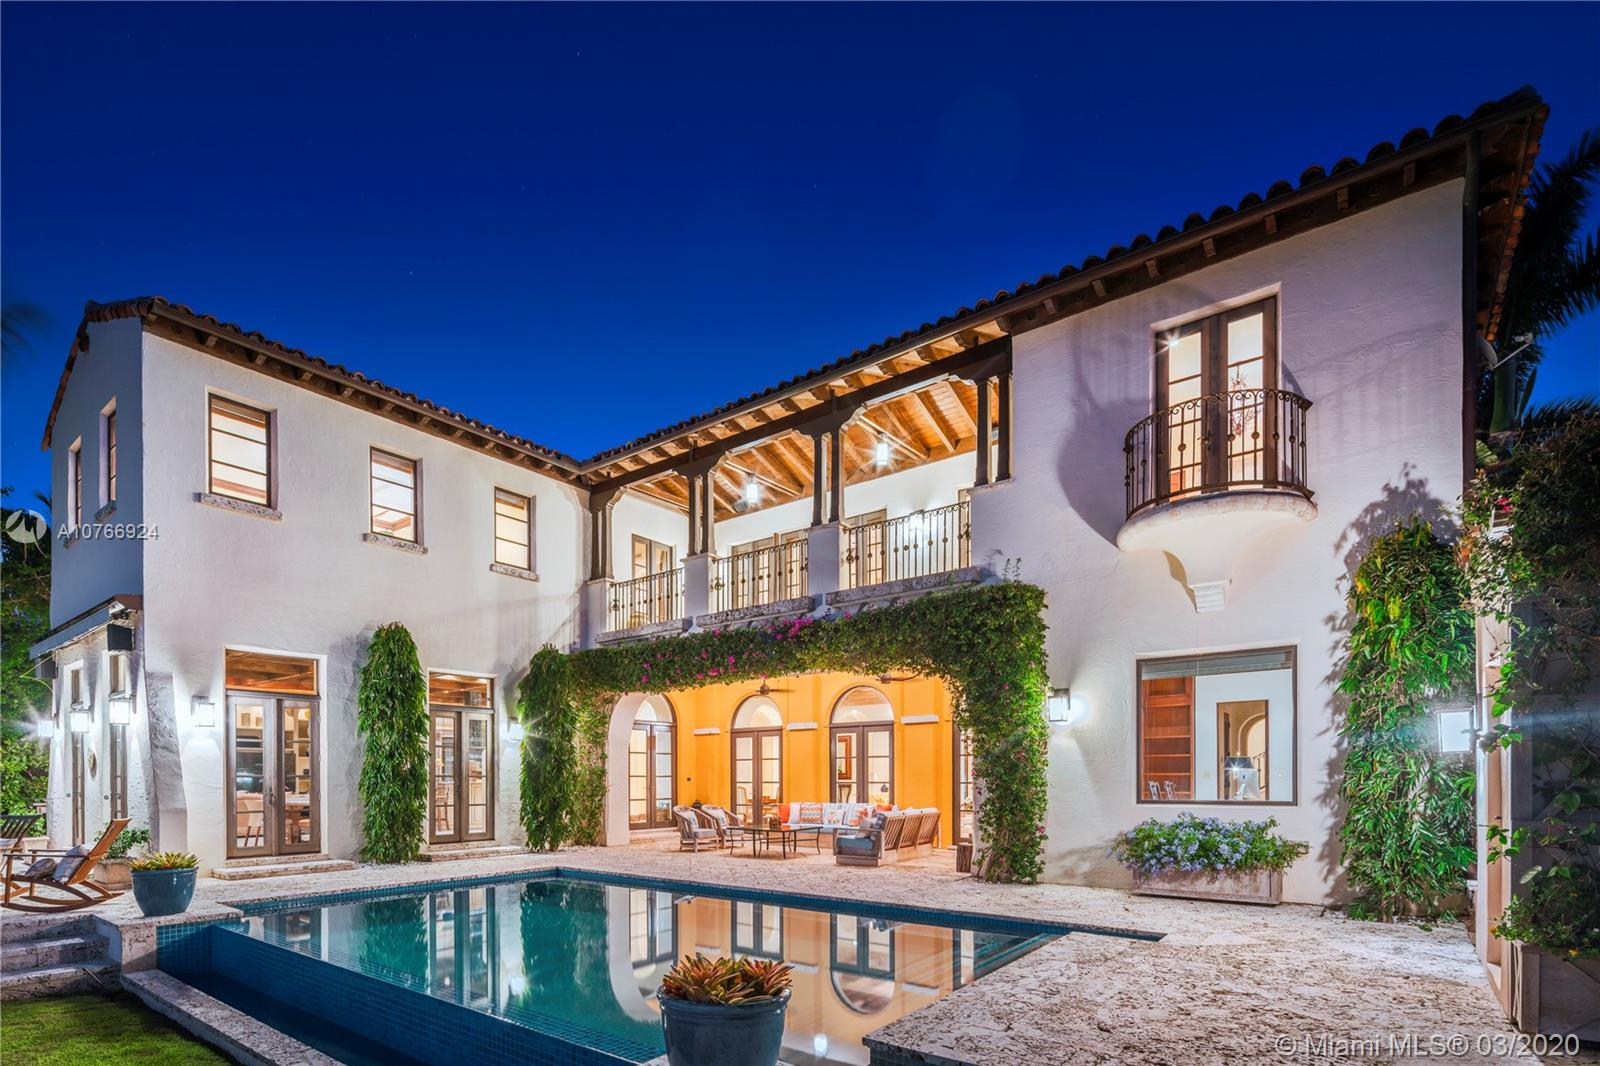 4420 N Bay Rd  For Sale A10766924, FL